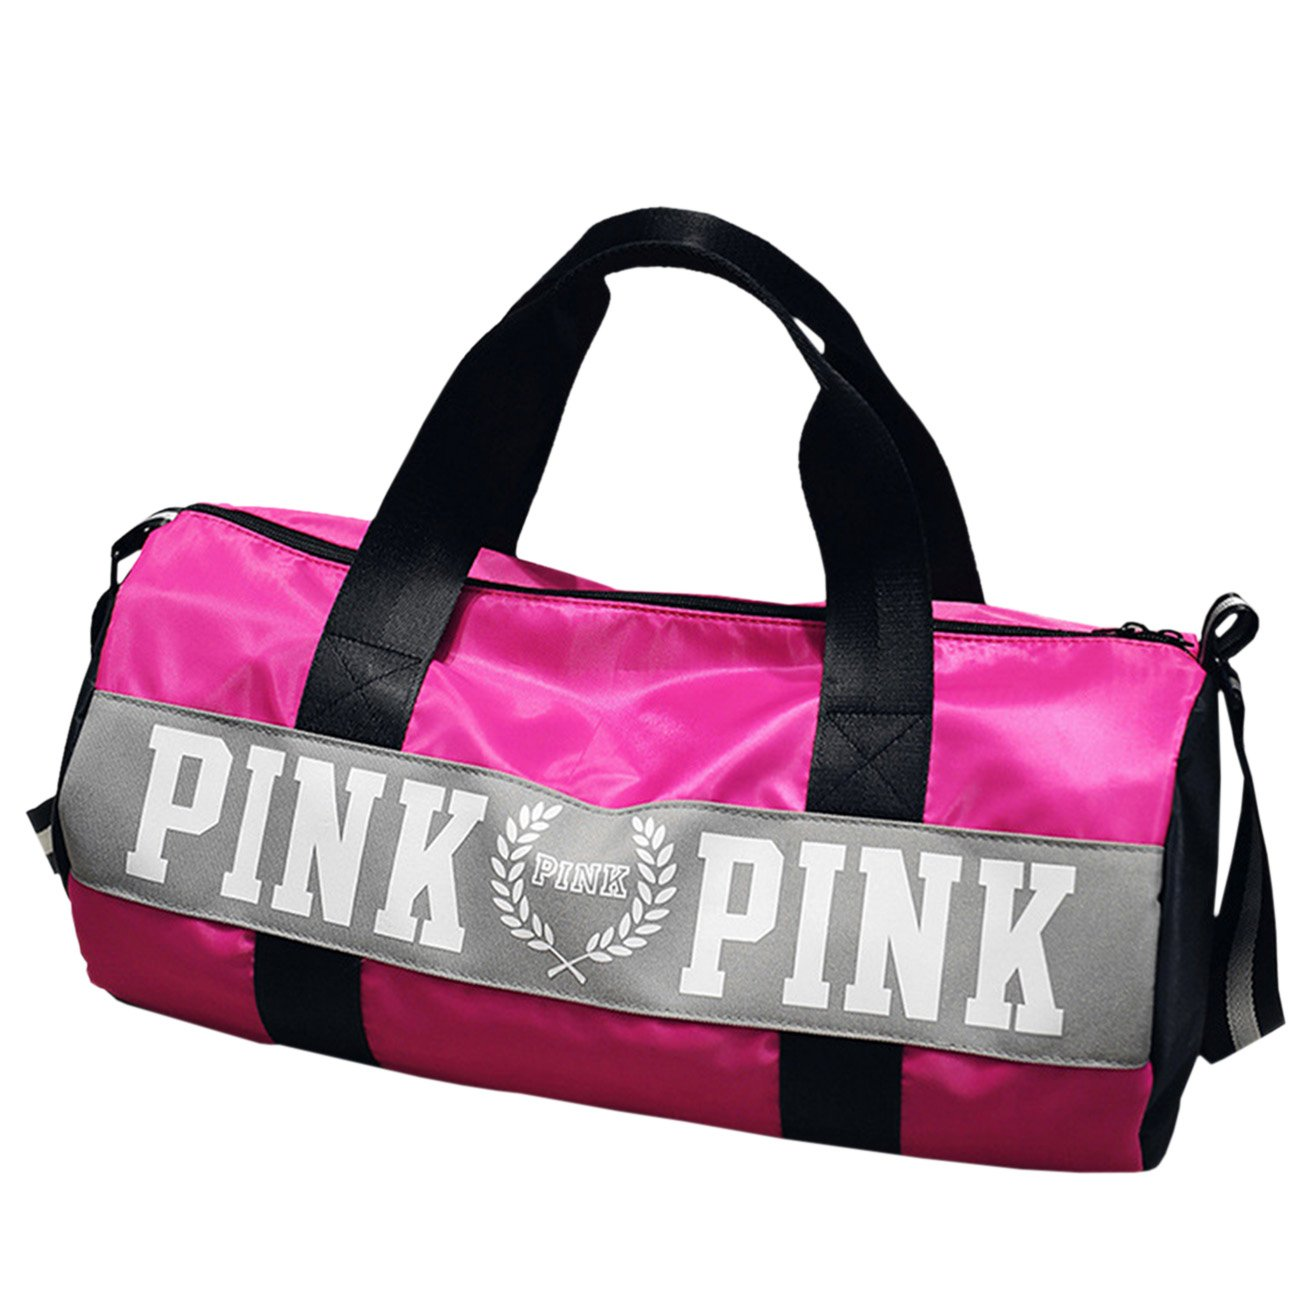 THEE High Capacity Waterproof Sports Bag Travel Tote Bag PFFPBB647pk